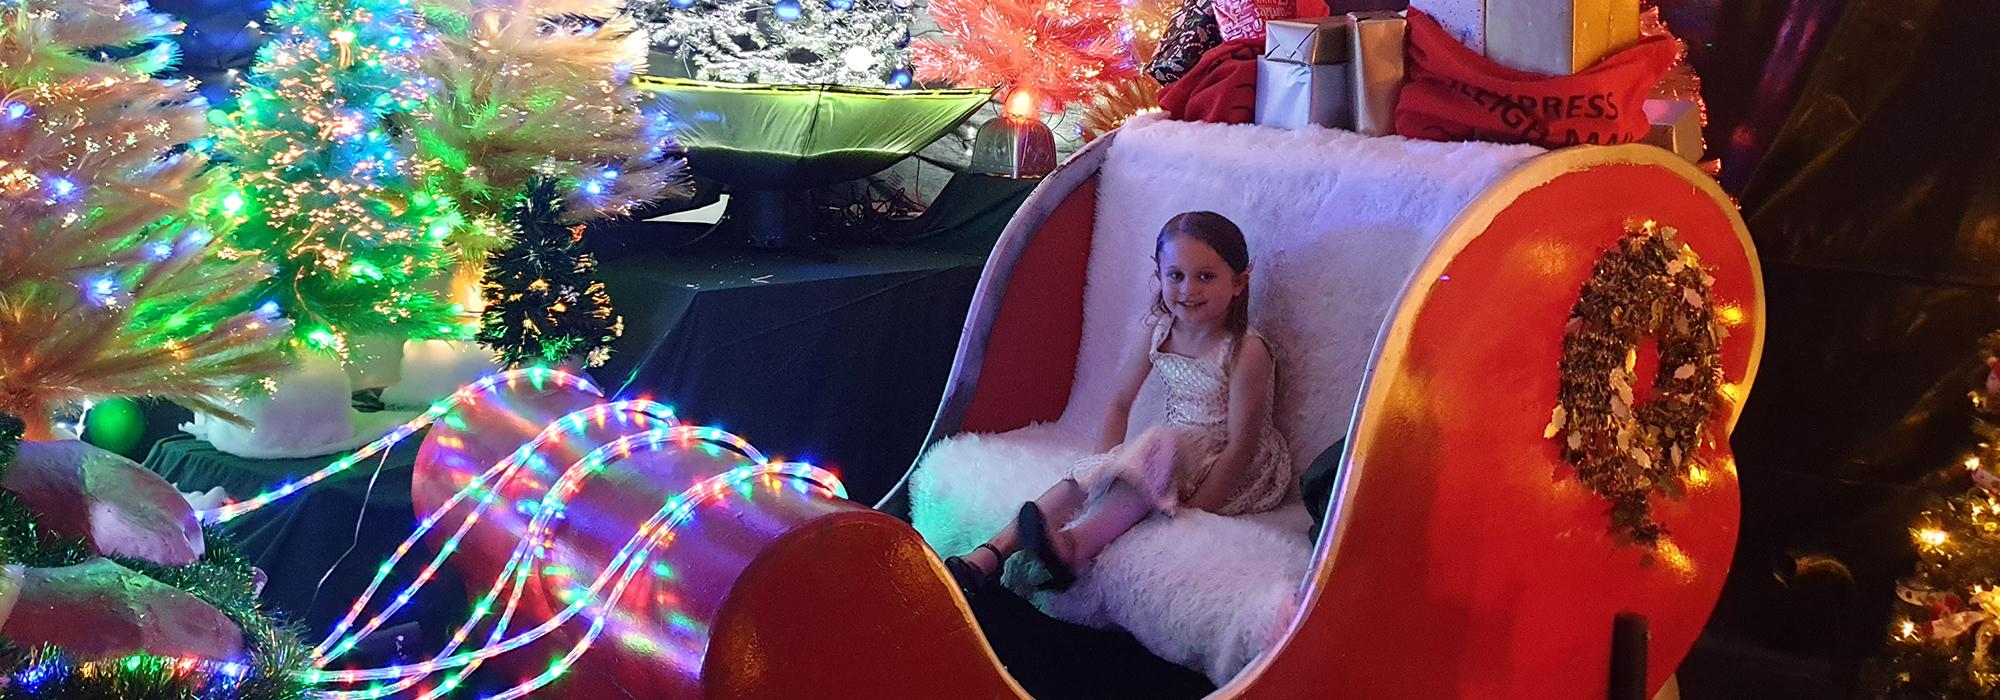 Make this Christmas merrier in Rotorua